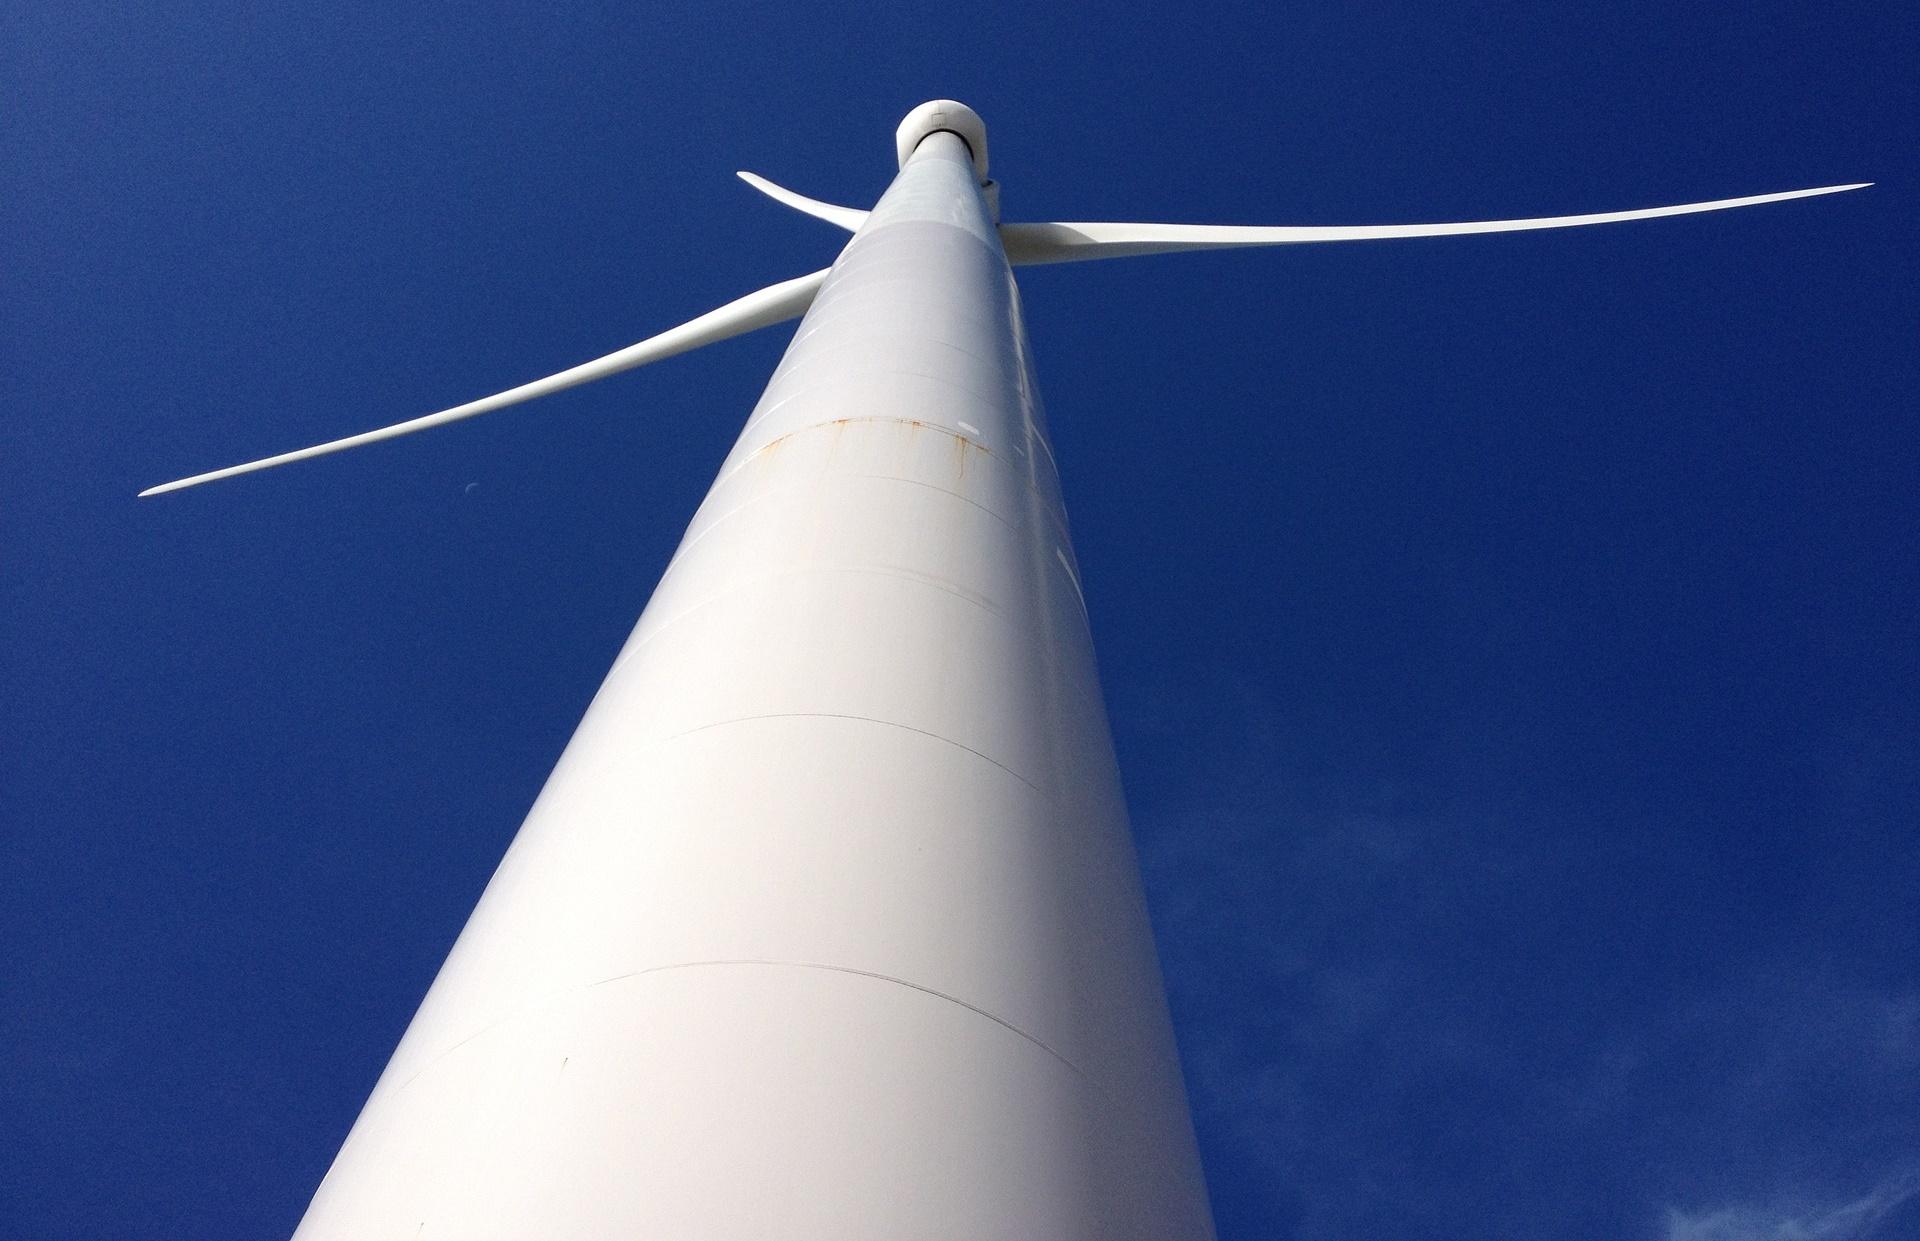 Turkey's Guris Holding starts building wind farm in Kosovo - report